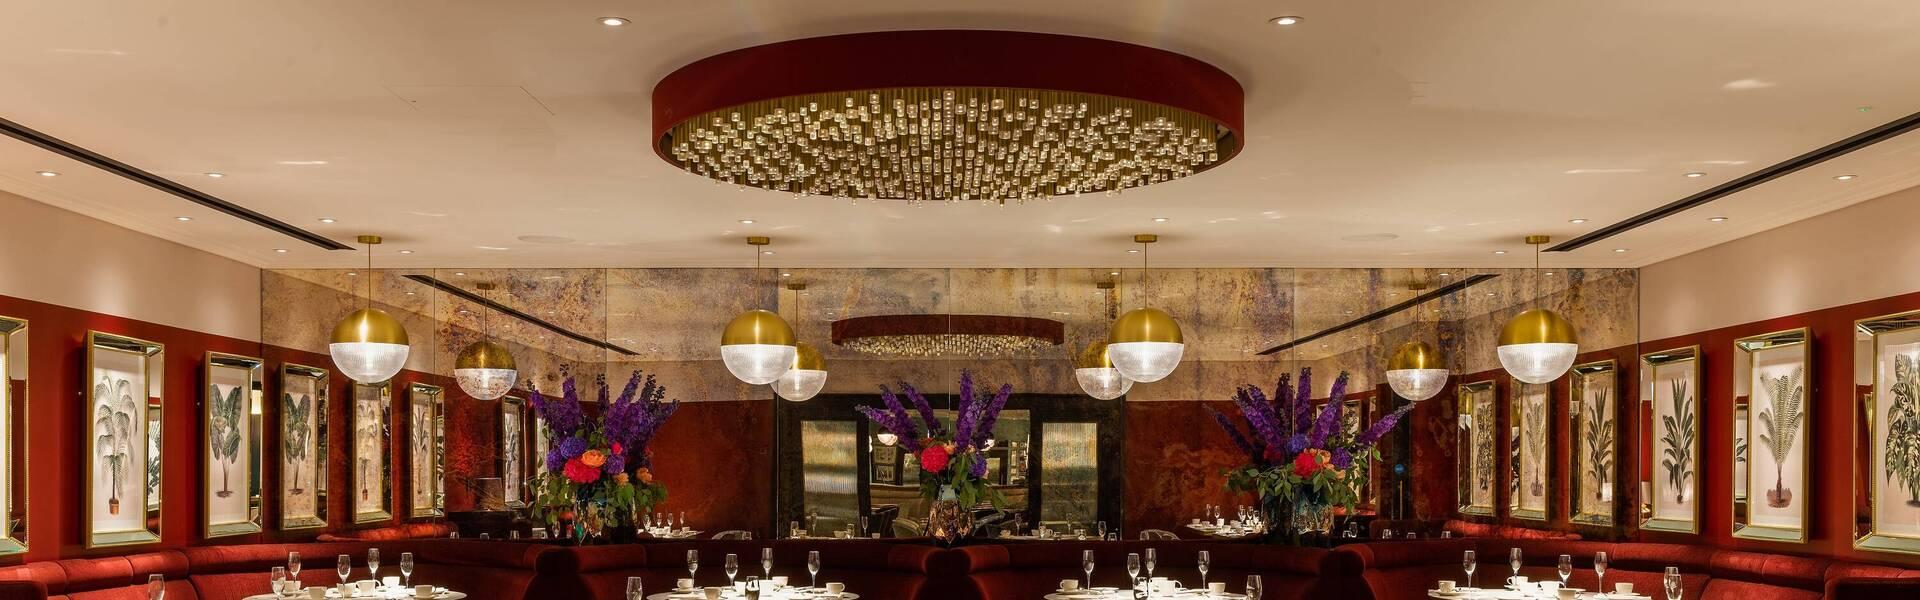 https://d337pdvlg6sju5.cloudfront.net/media/images/properties/united-kingdom/london/strand-palace/restaurants-and-bars/afternoontea/june-20-strand-palace-hr-4_201_1920x600.jpg